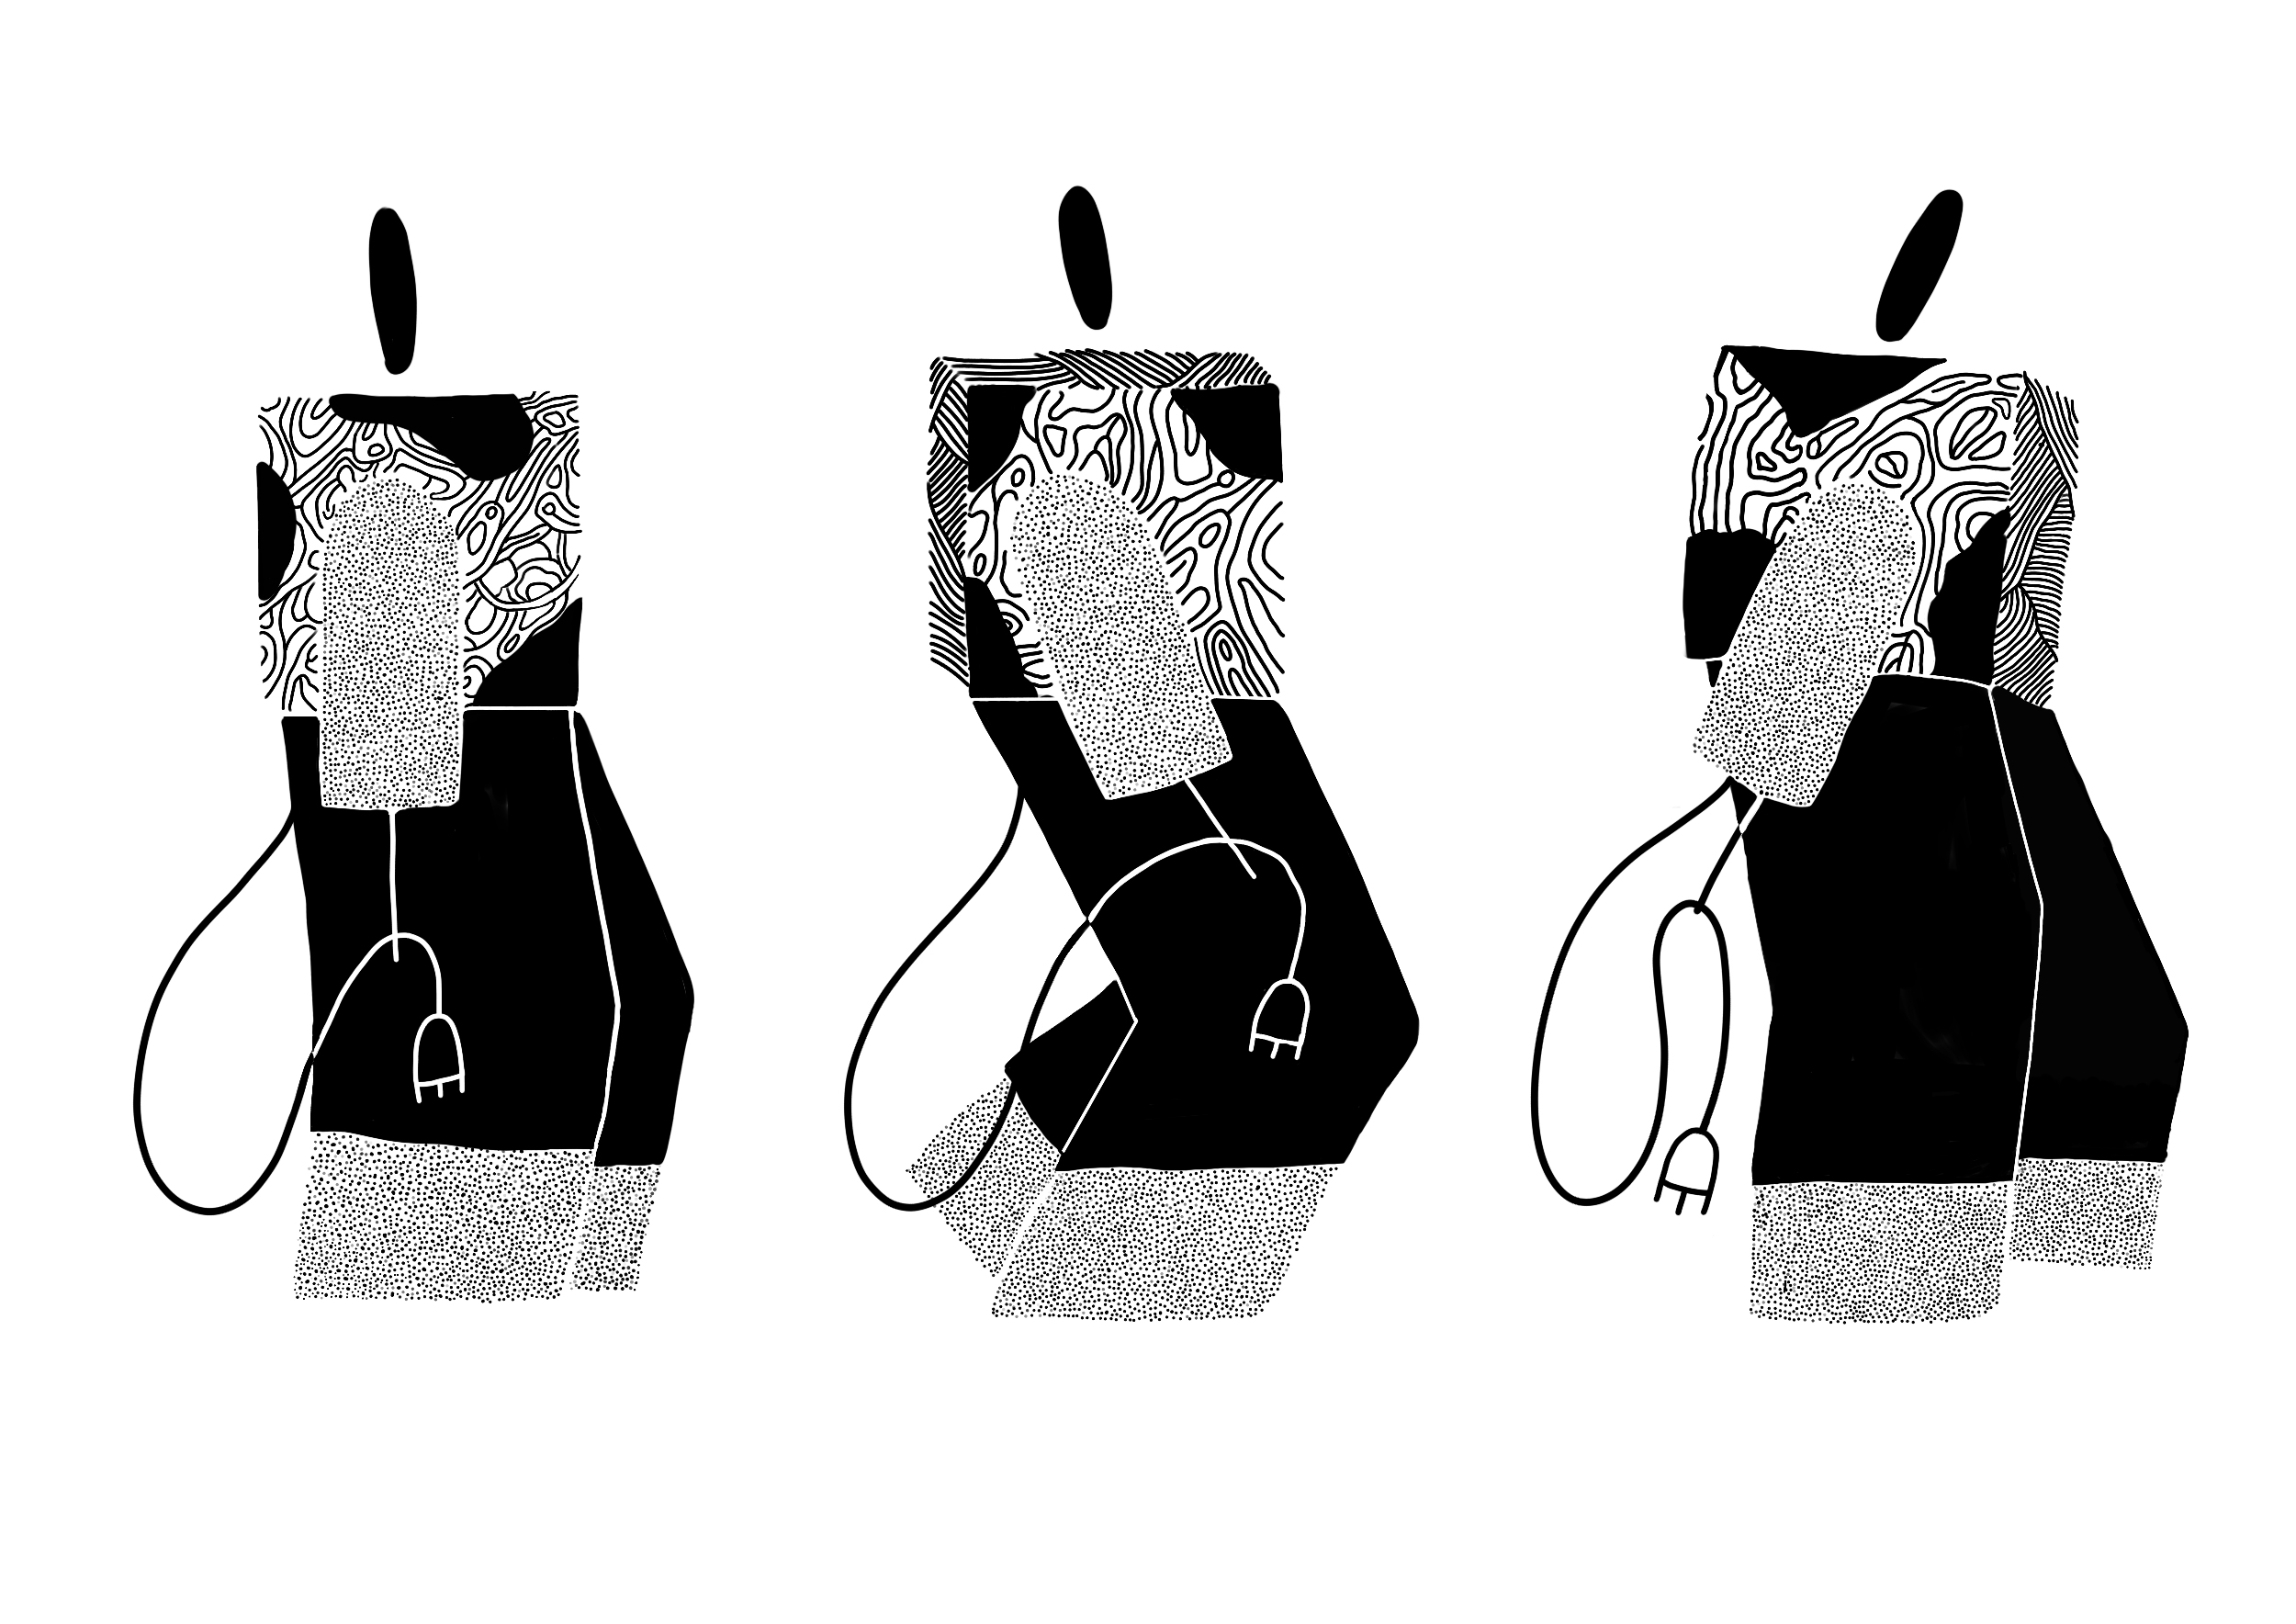 Illustration by Mariah Arvanitakis.